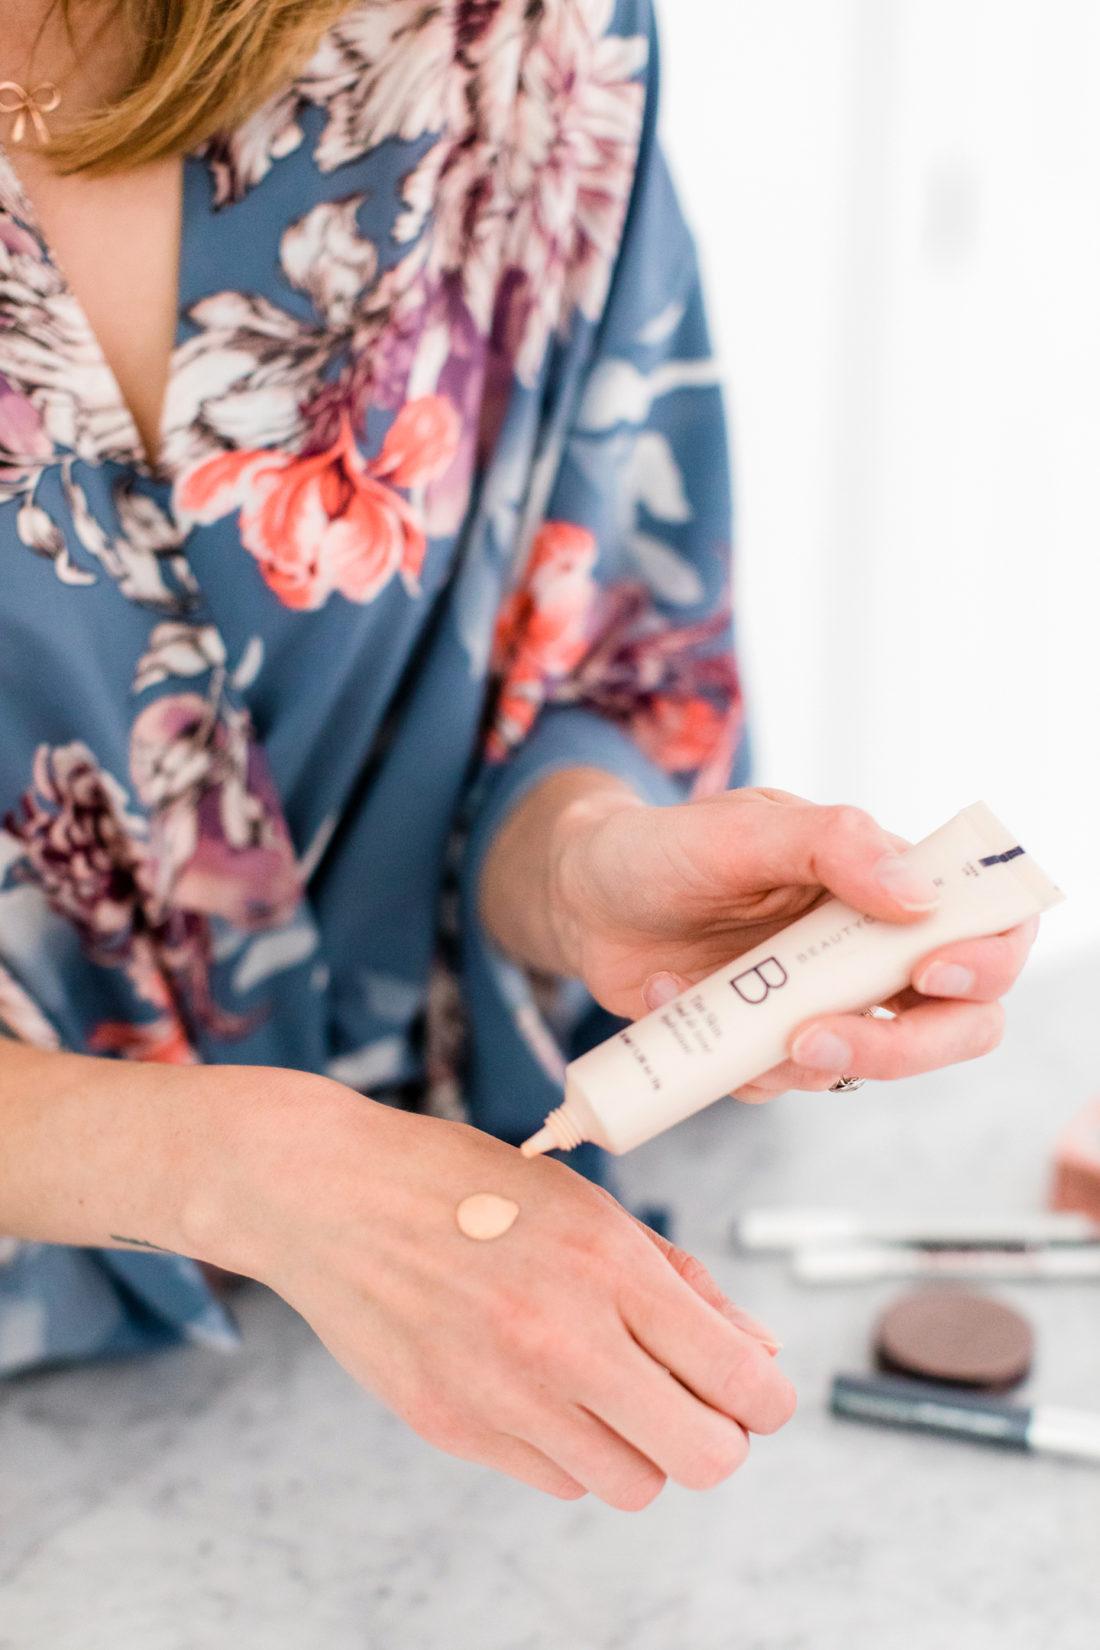 Eva Amurri martino applies a lightweight foundation as part of her photo shoot makeup tutorial